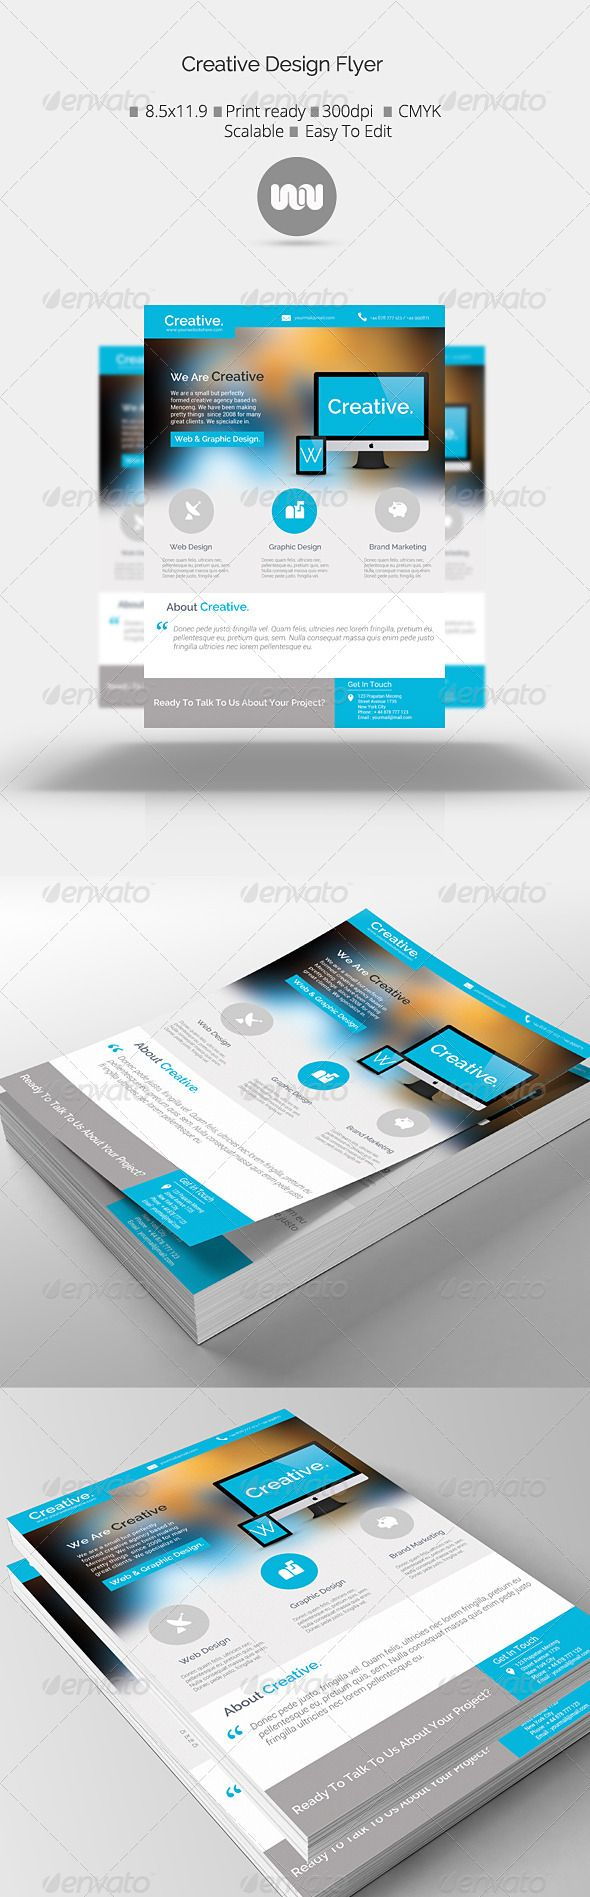 Creative Design Agency Flyer - Corporate Flyers   Download http://graphicriver.net/item/creative-design-agency-flyer/7110563?ref=sinzo